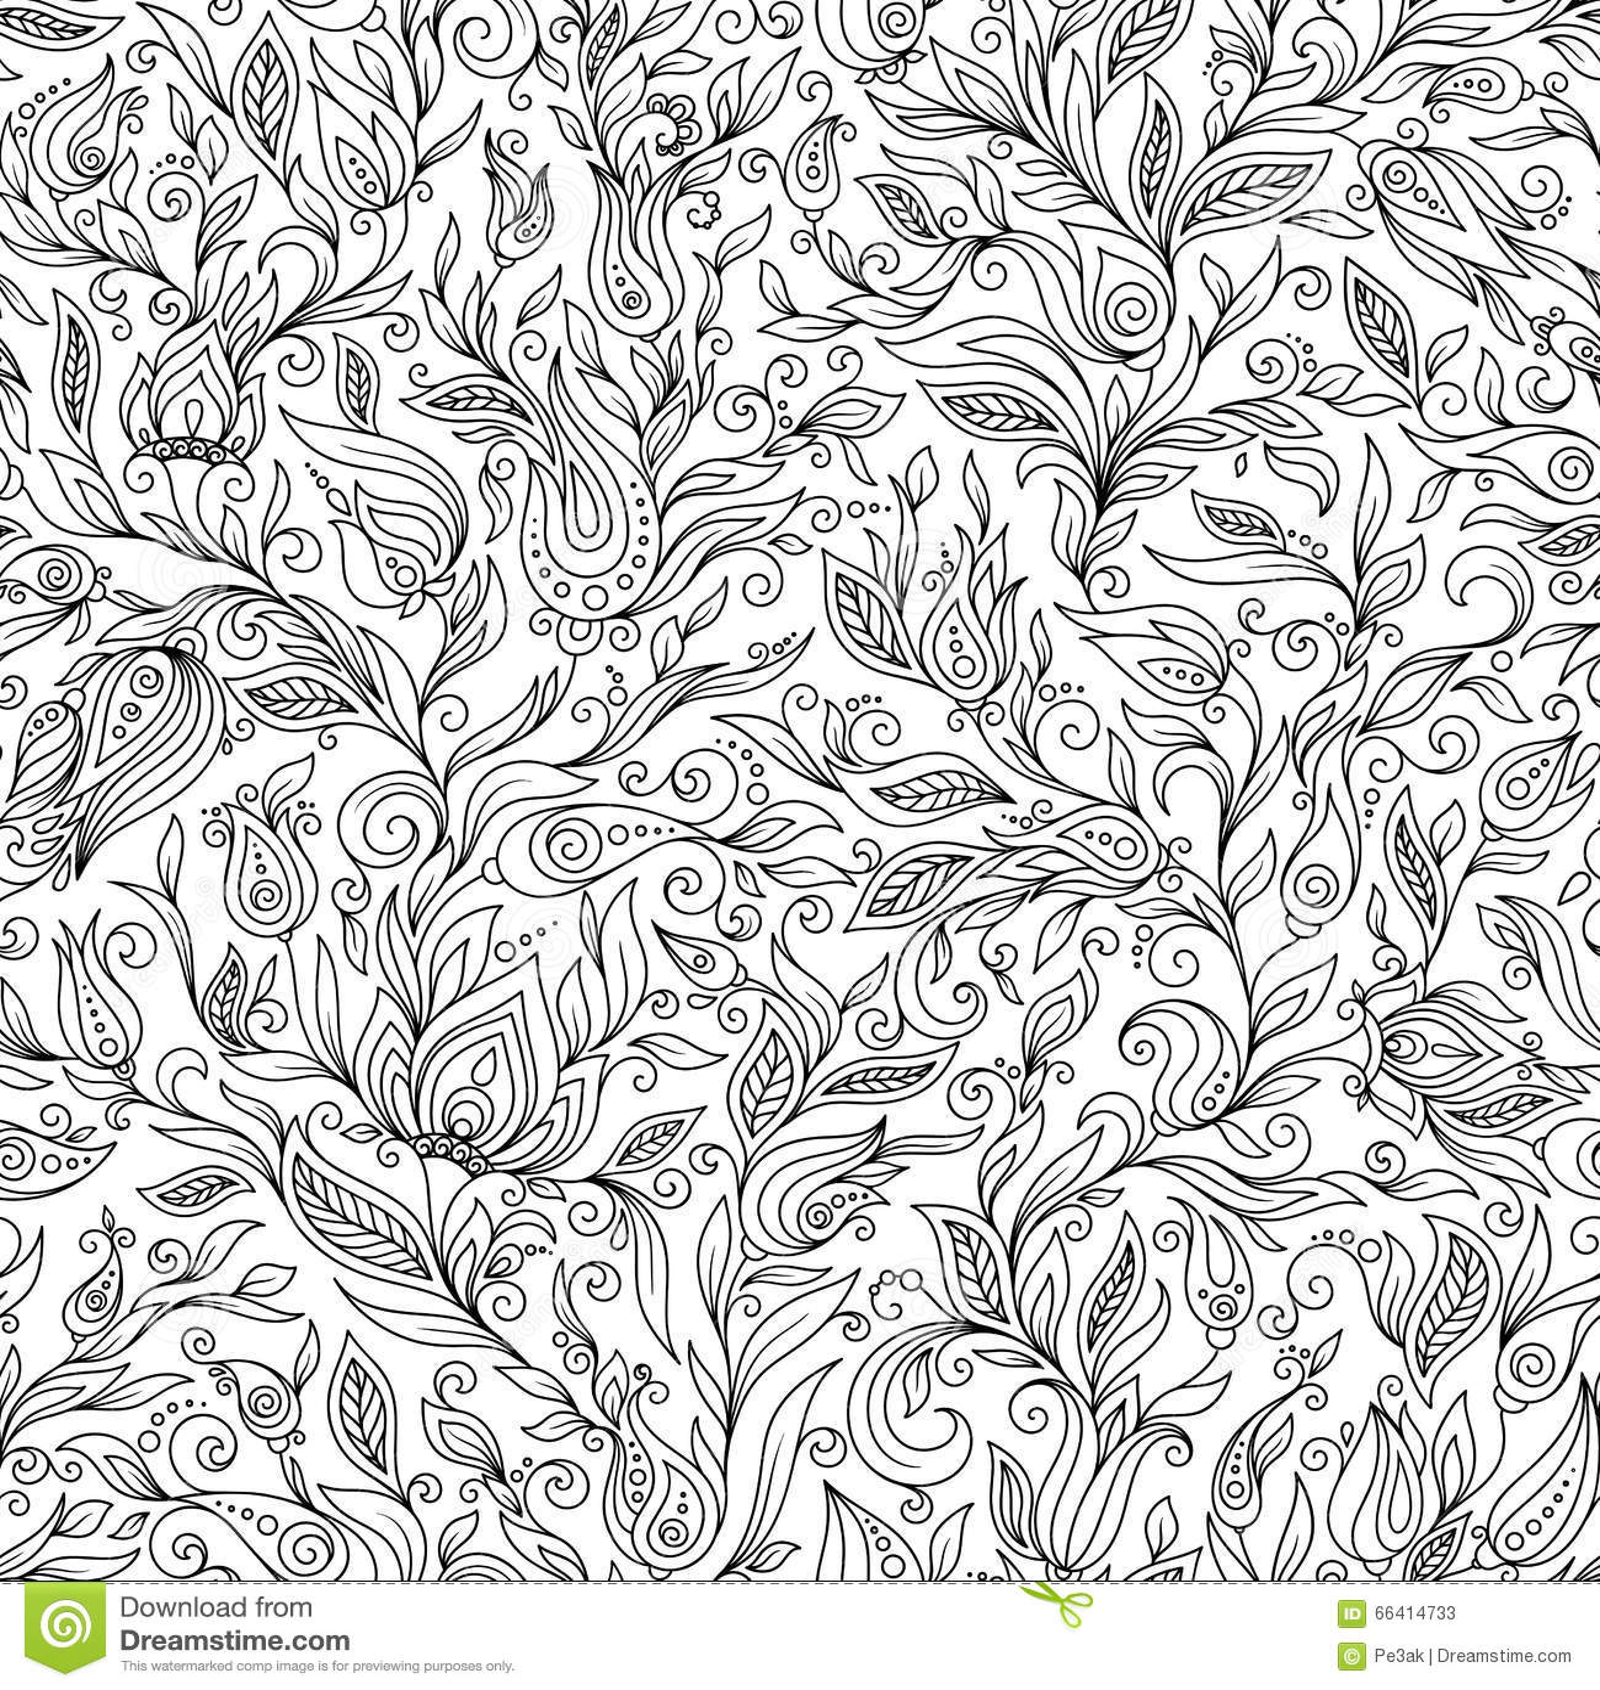 Pattern For Coloring Book Floral Doodle Design